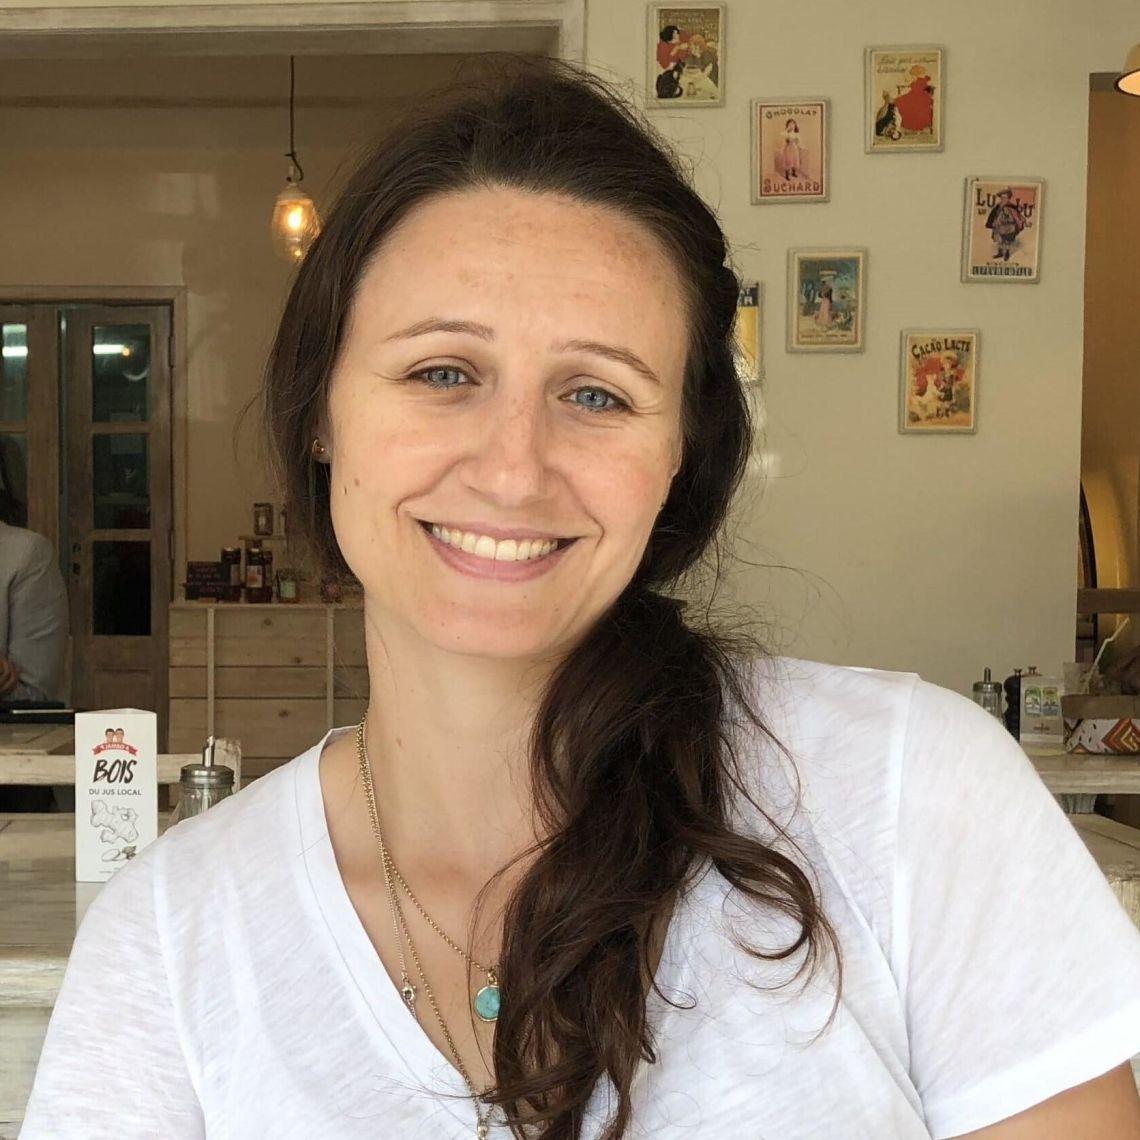 Katherine Kalaris